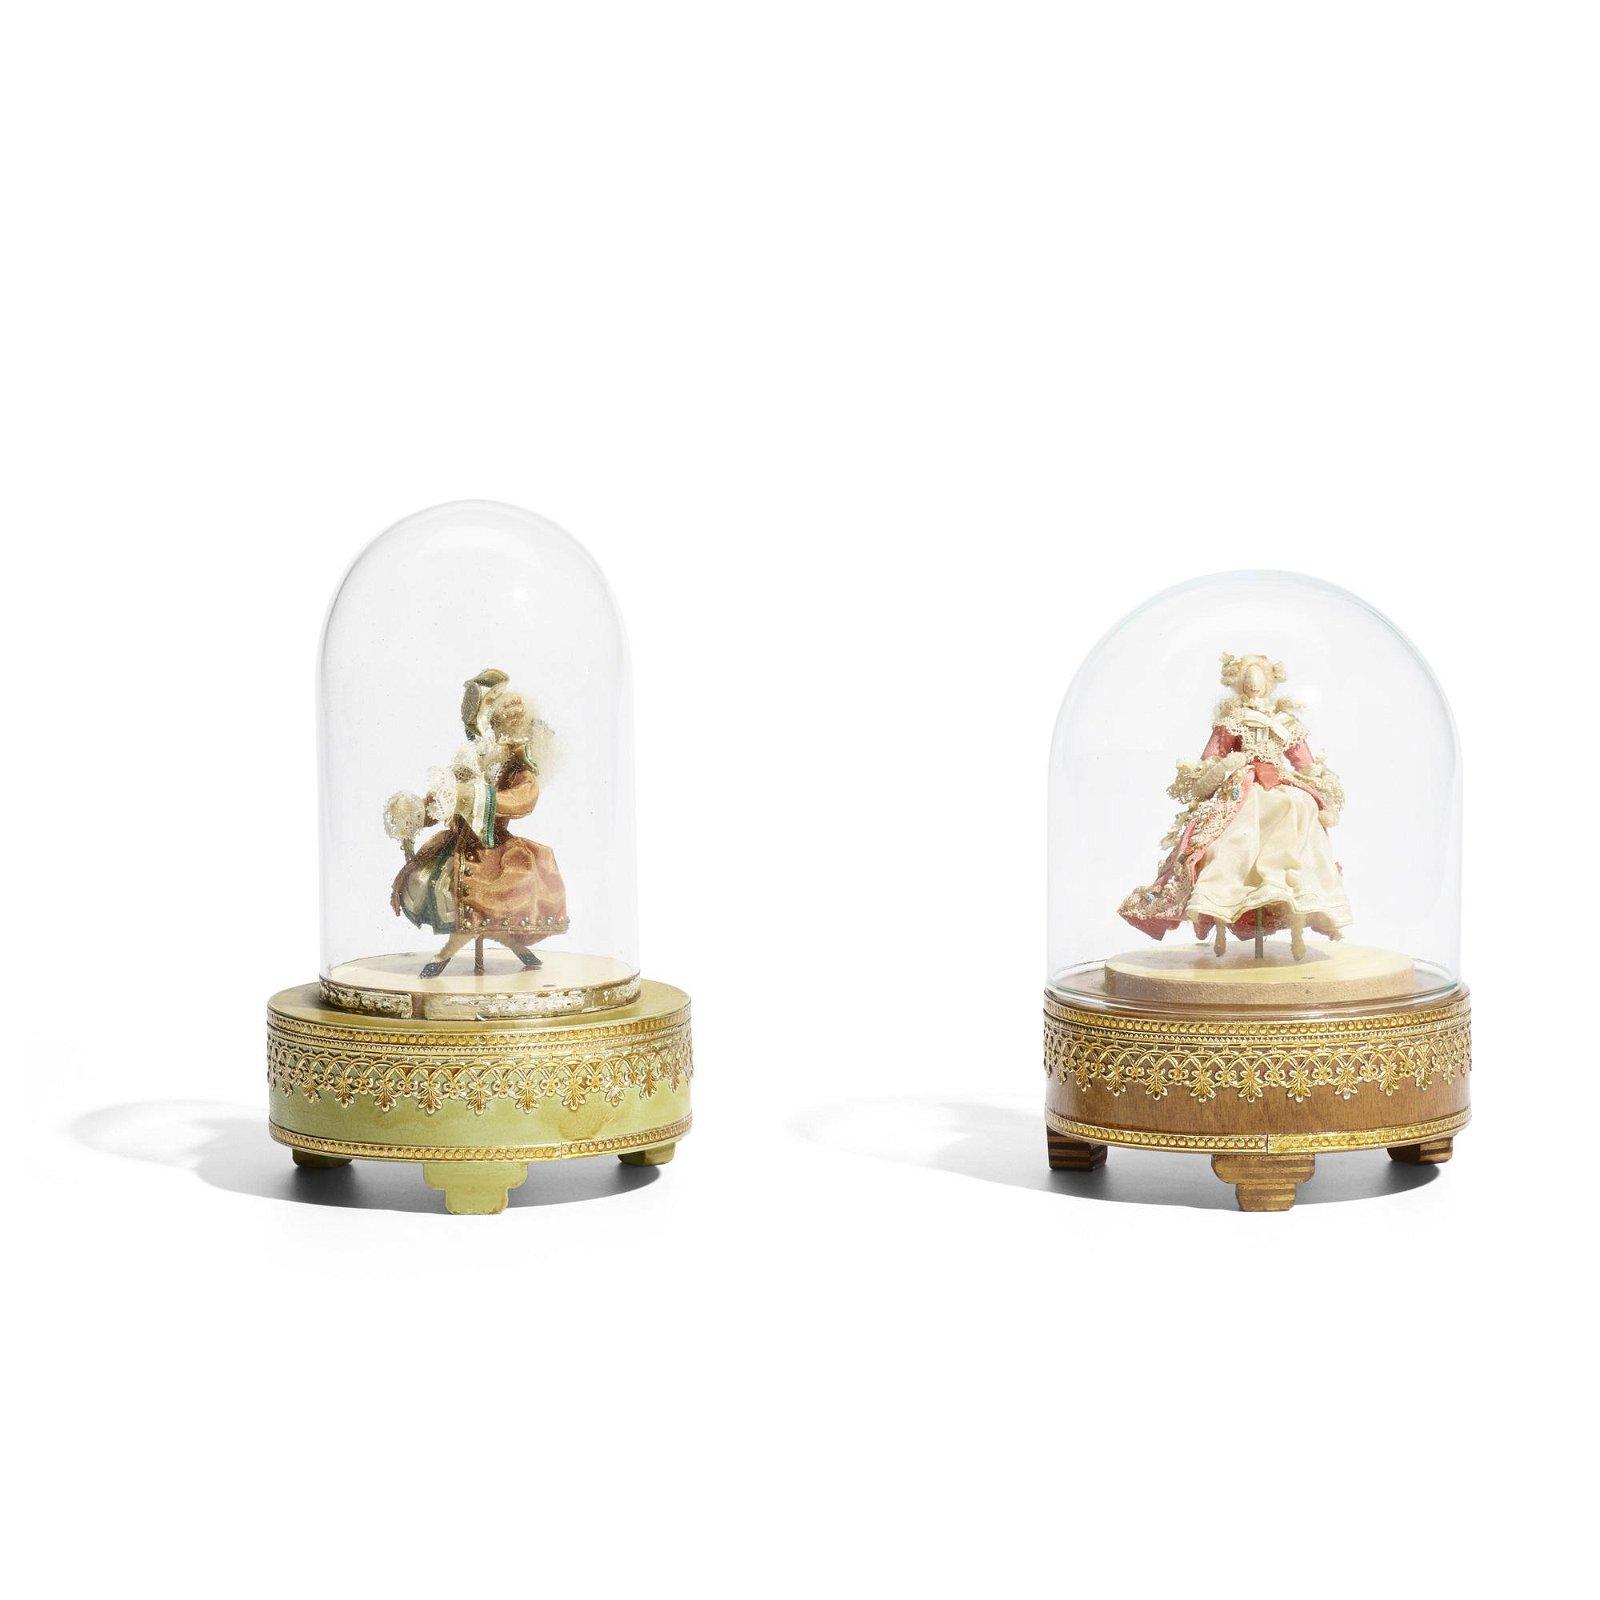 Louis Vuitton, Automatons, set of two